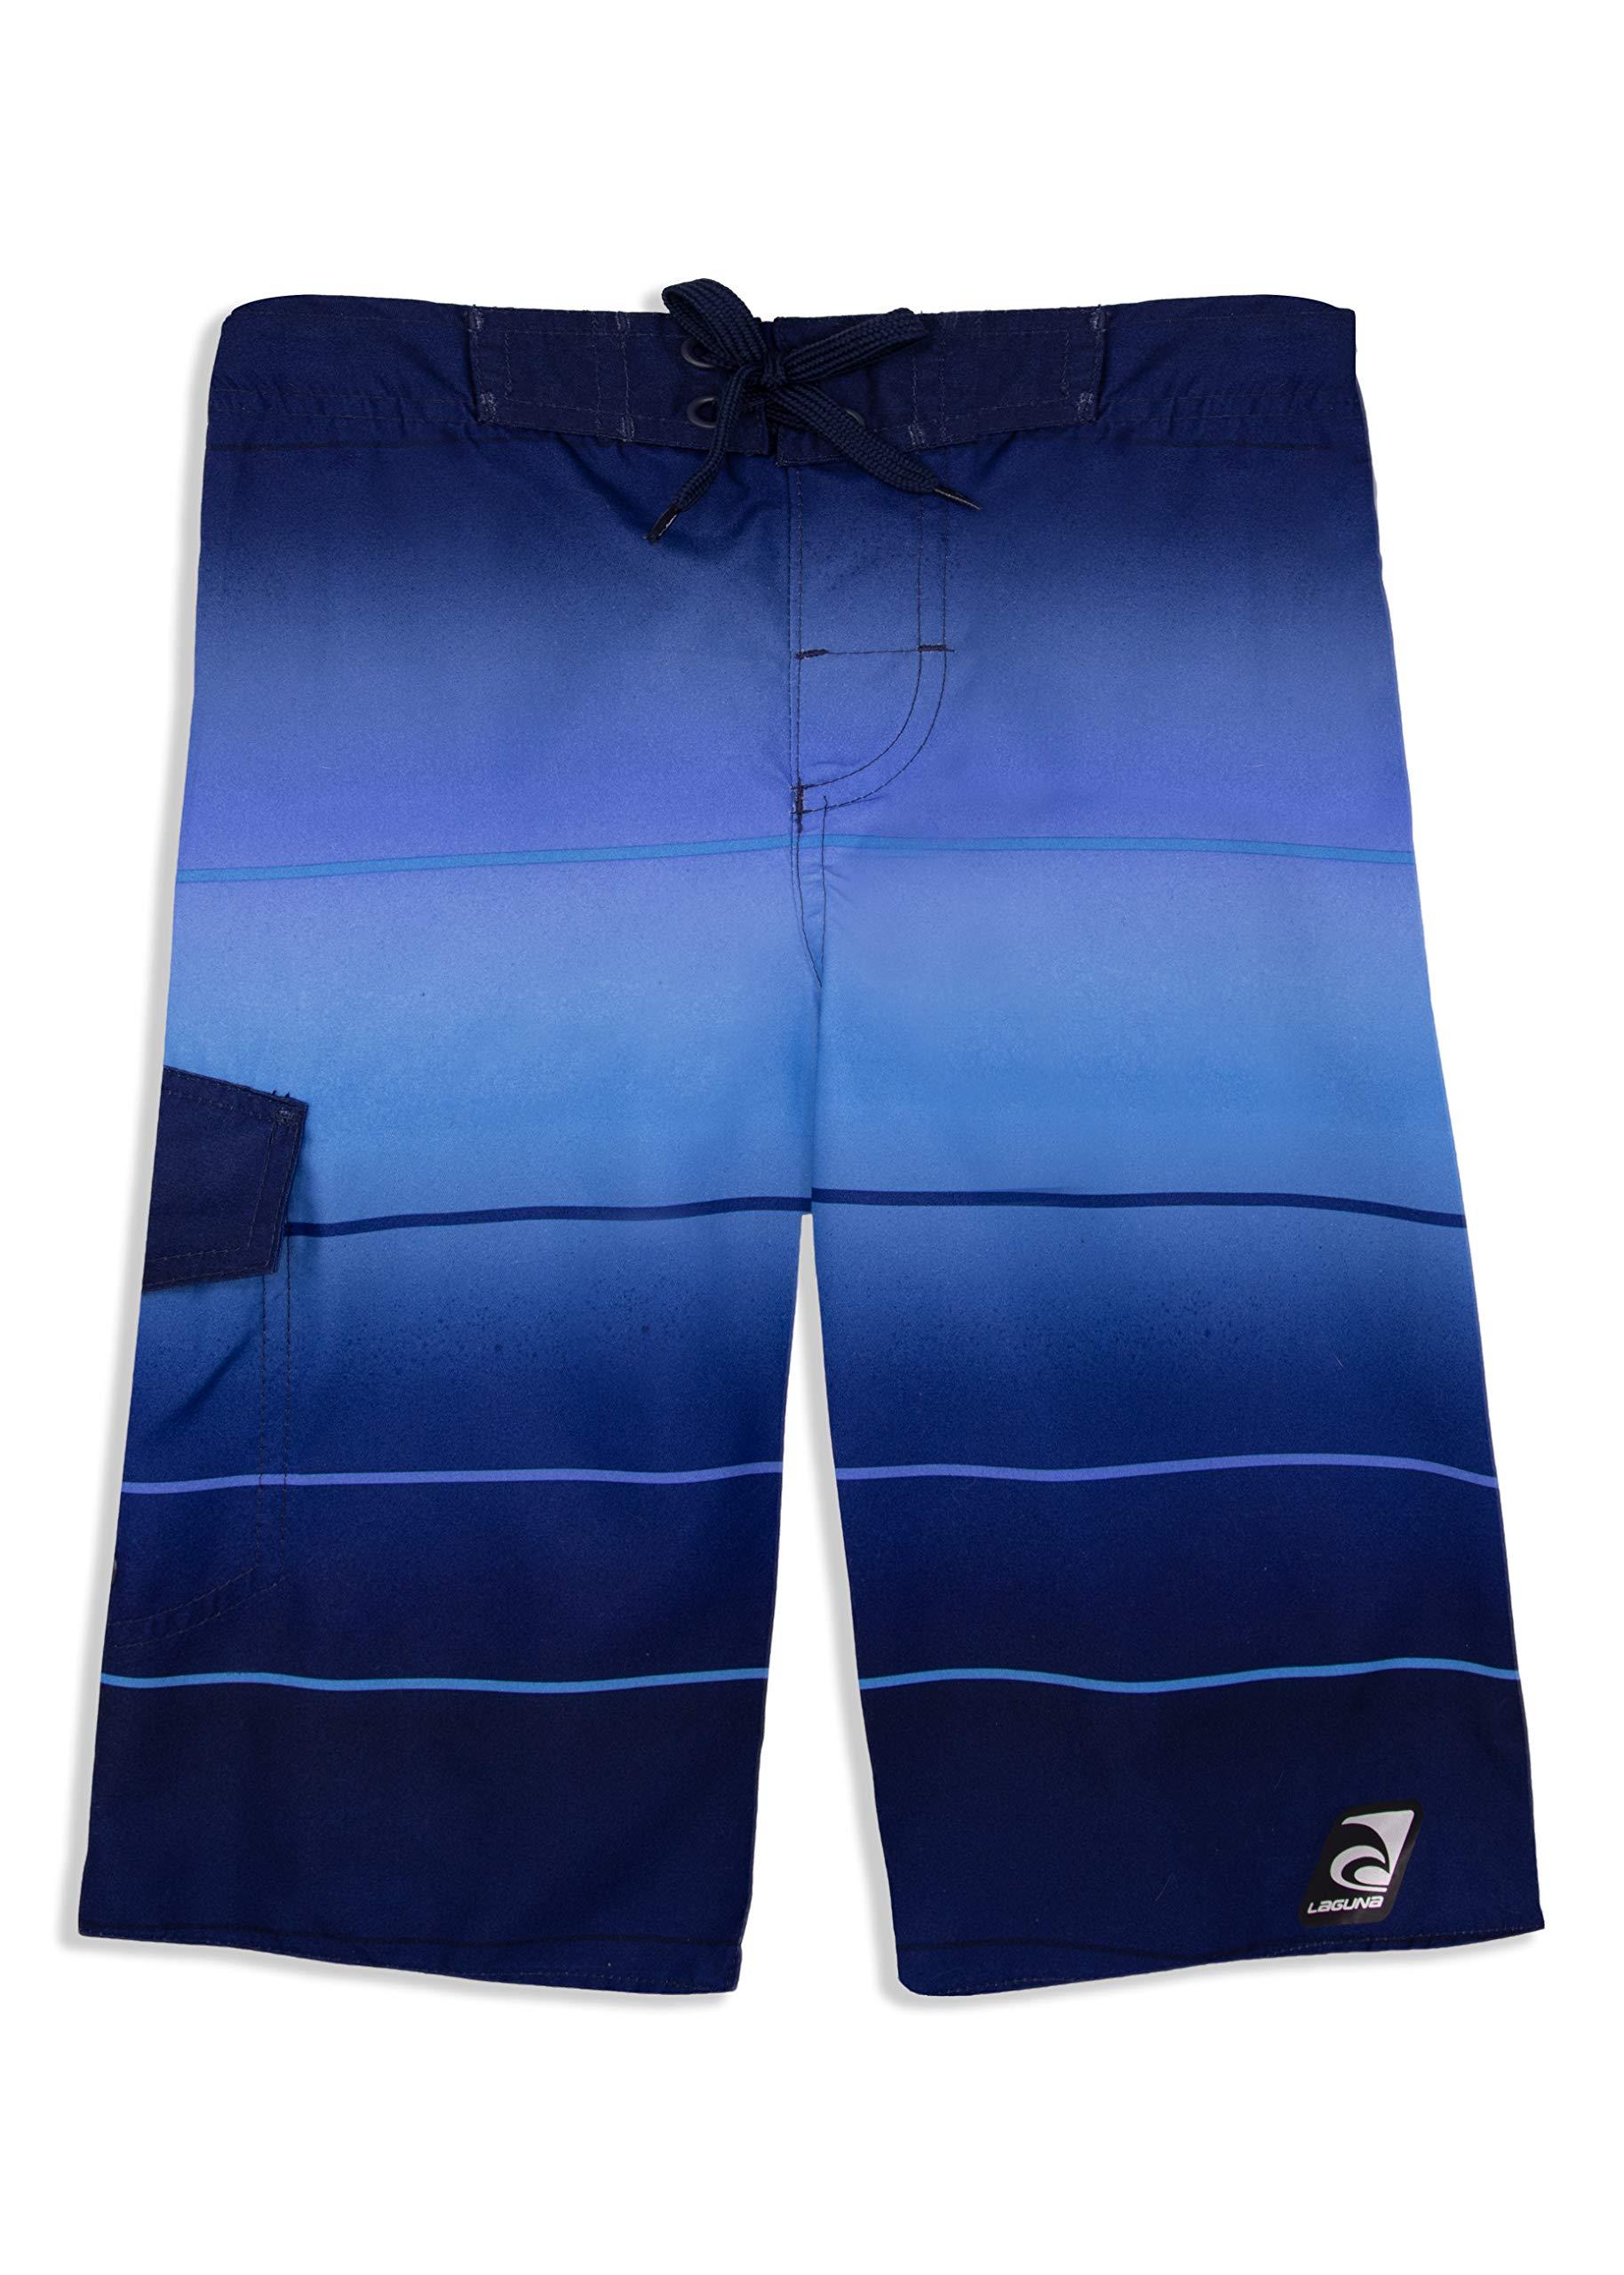 LAGUNA Boys Epic Stripe Multicolor Boardshorts Swim Trunks, UPF 50+, Blue, 14/16